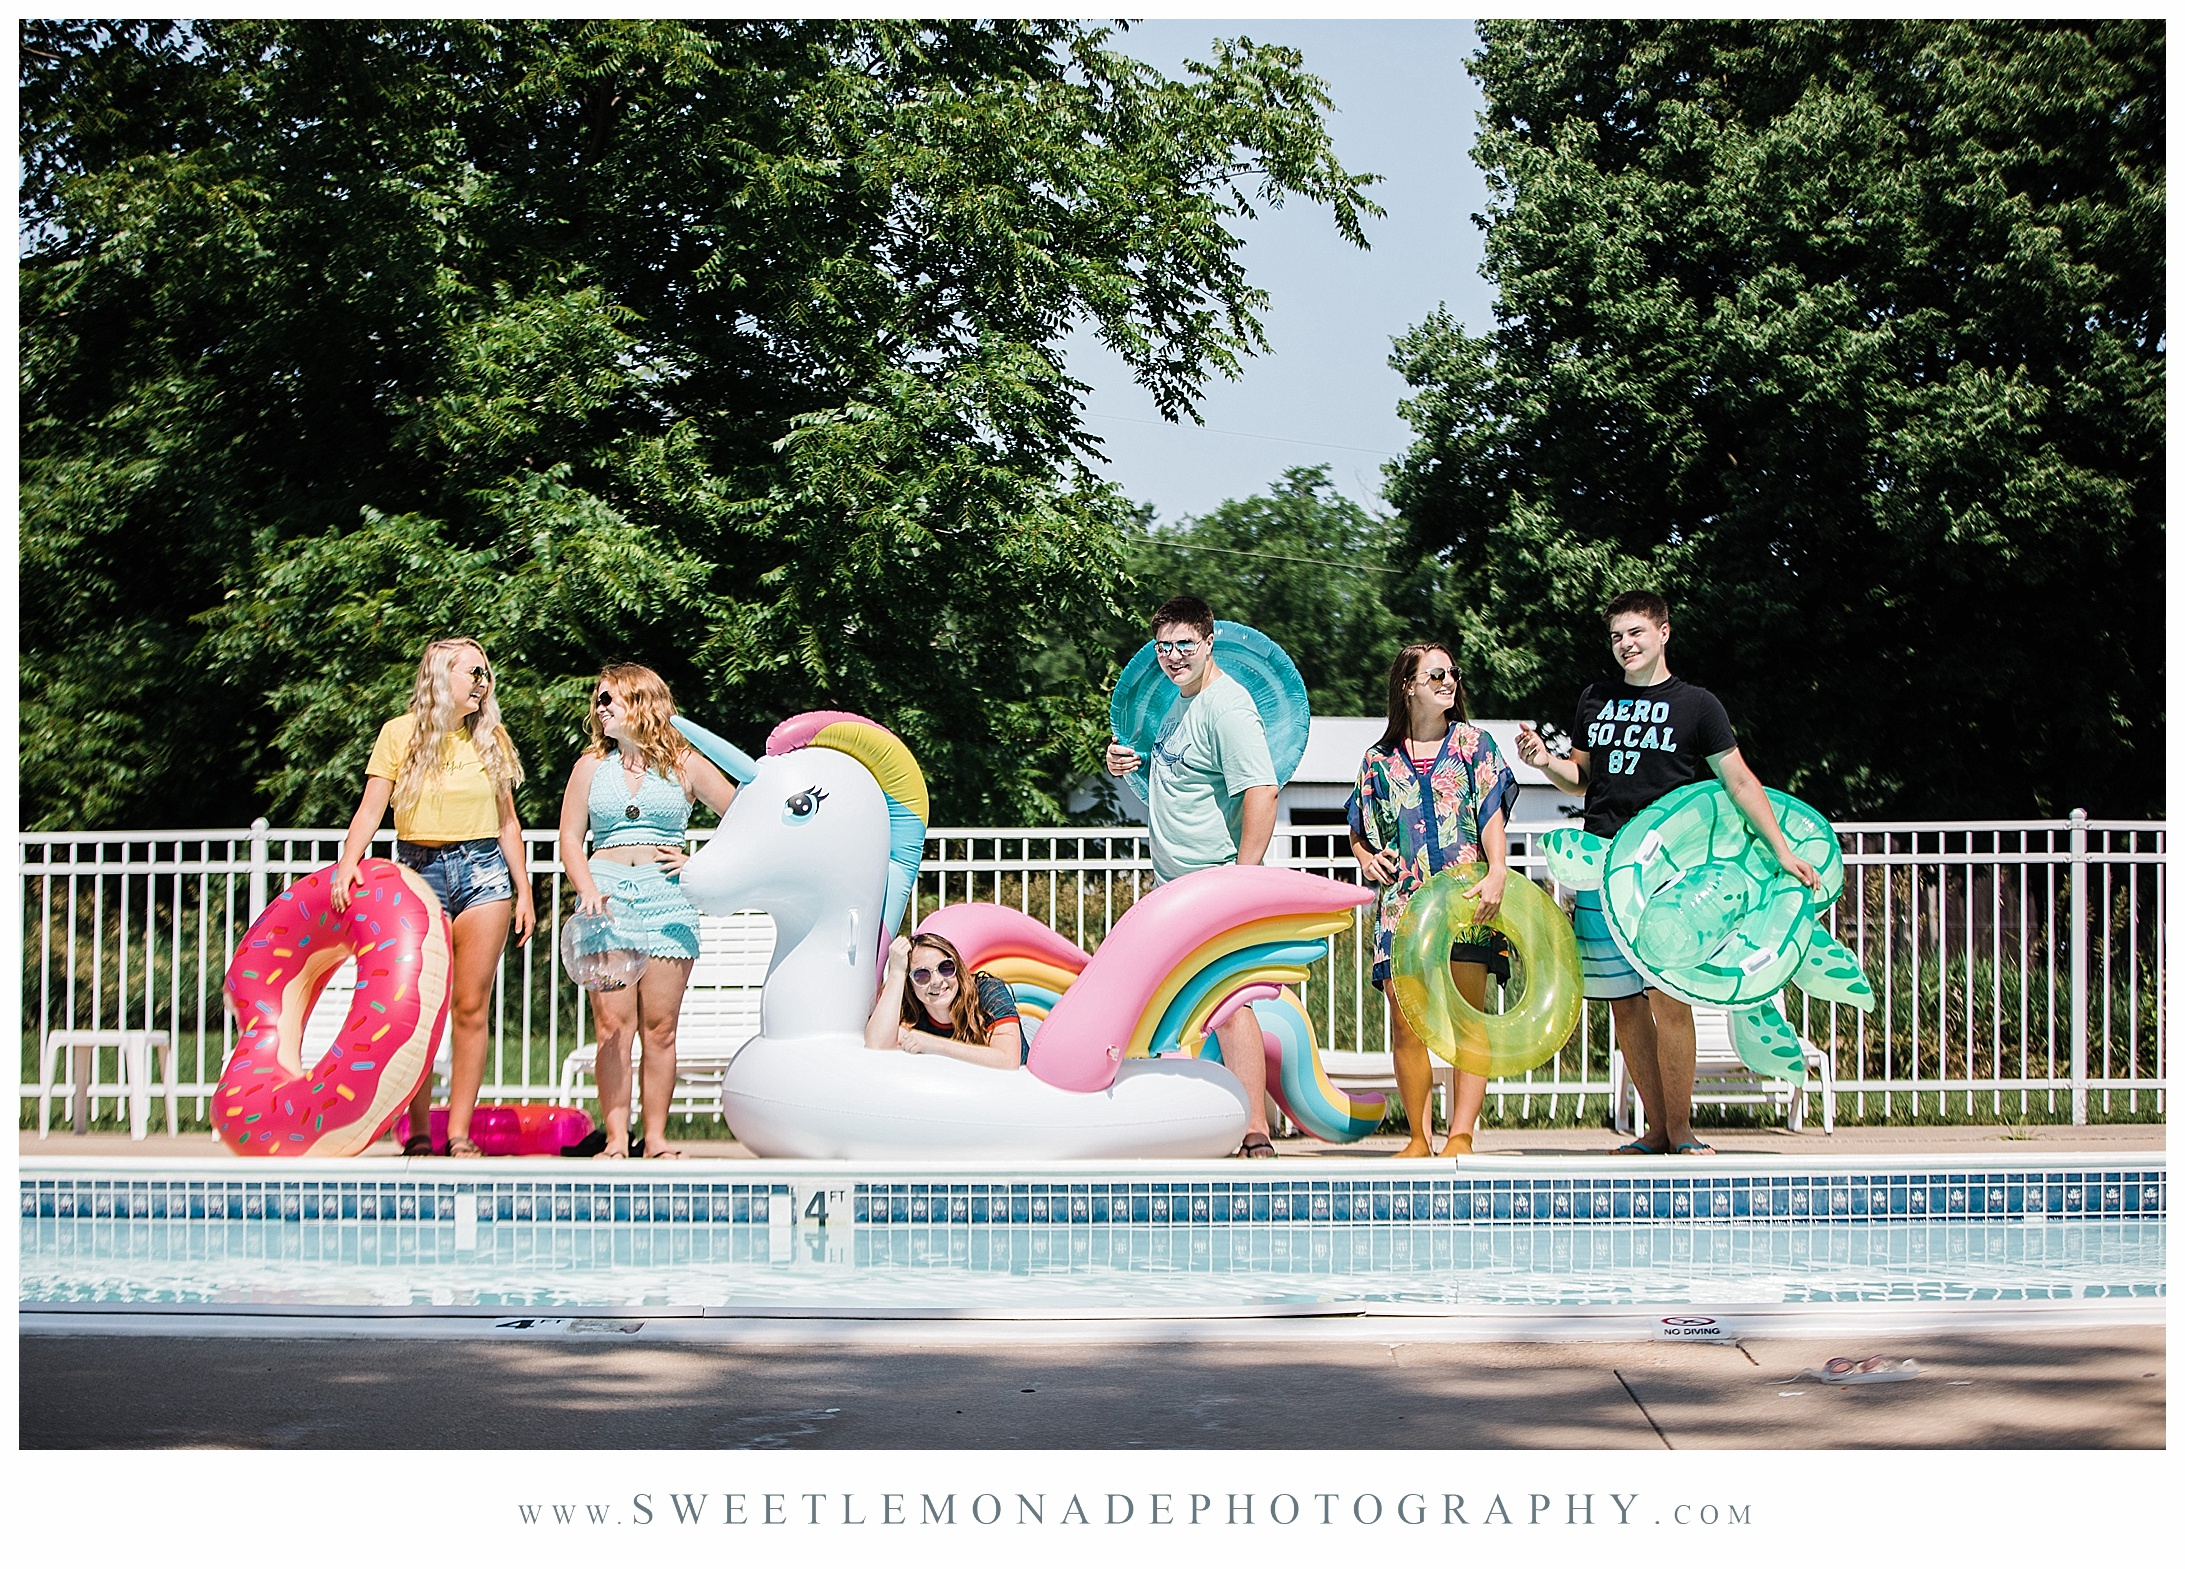 champaign-senior-photographer-sweet-lemonade-photography-senior-pictures-pool_2172.jpg